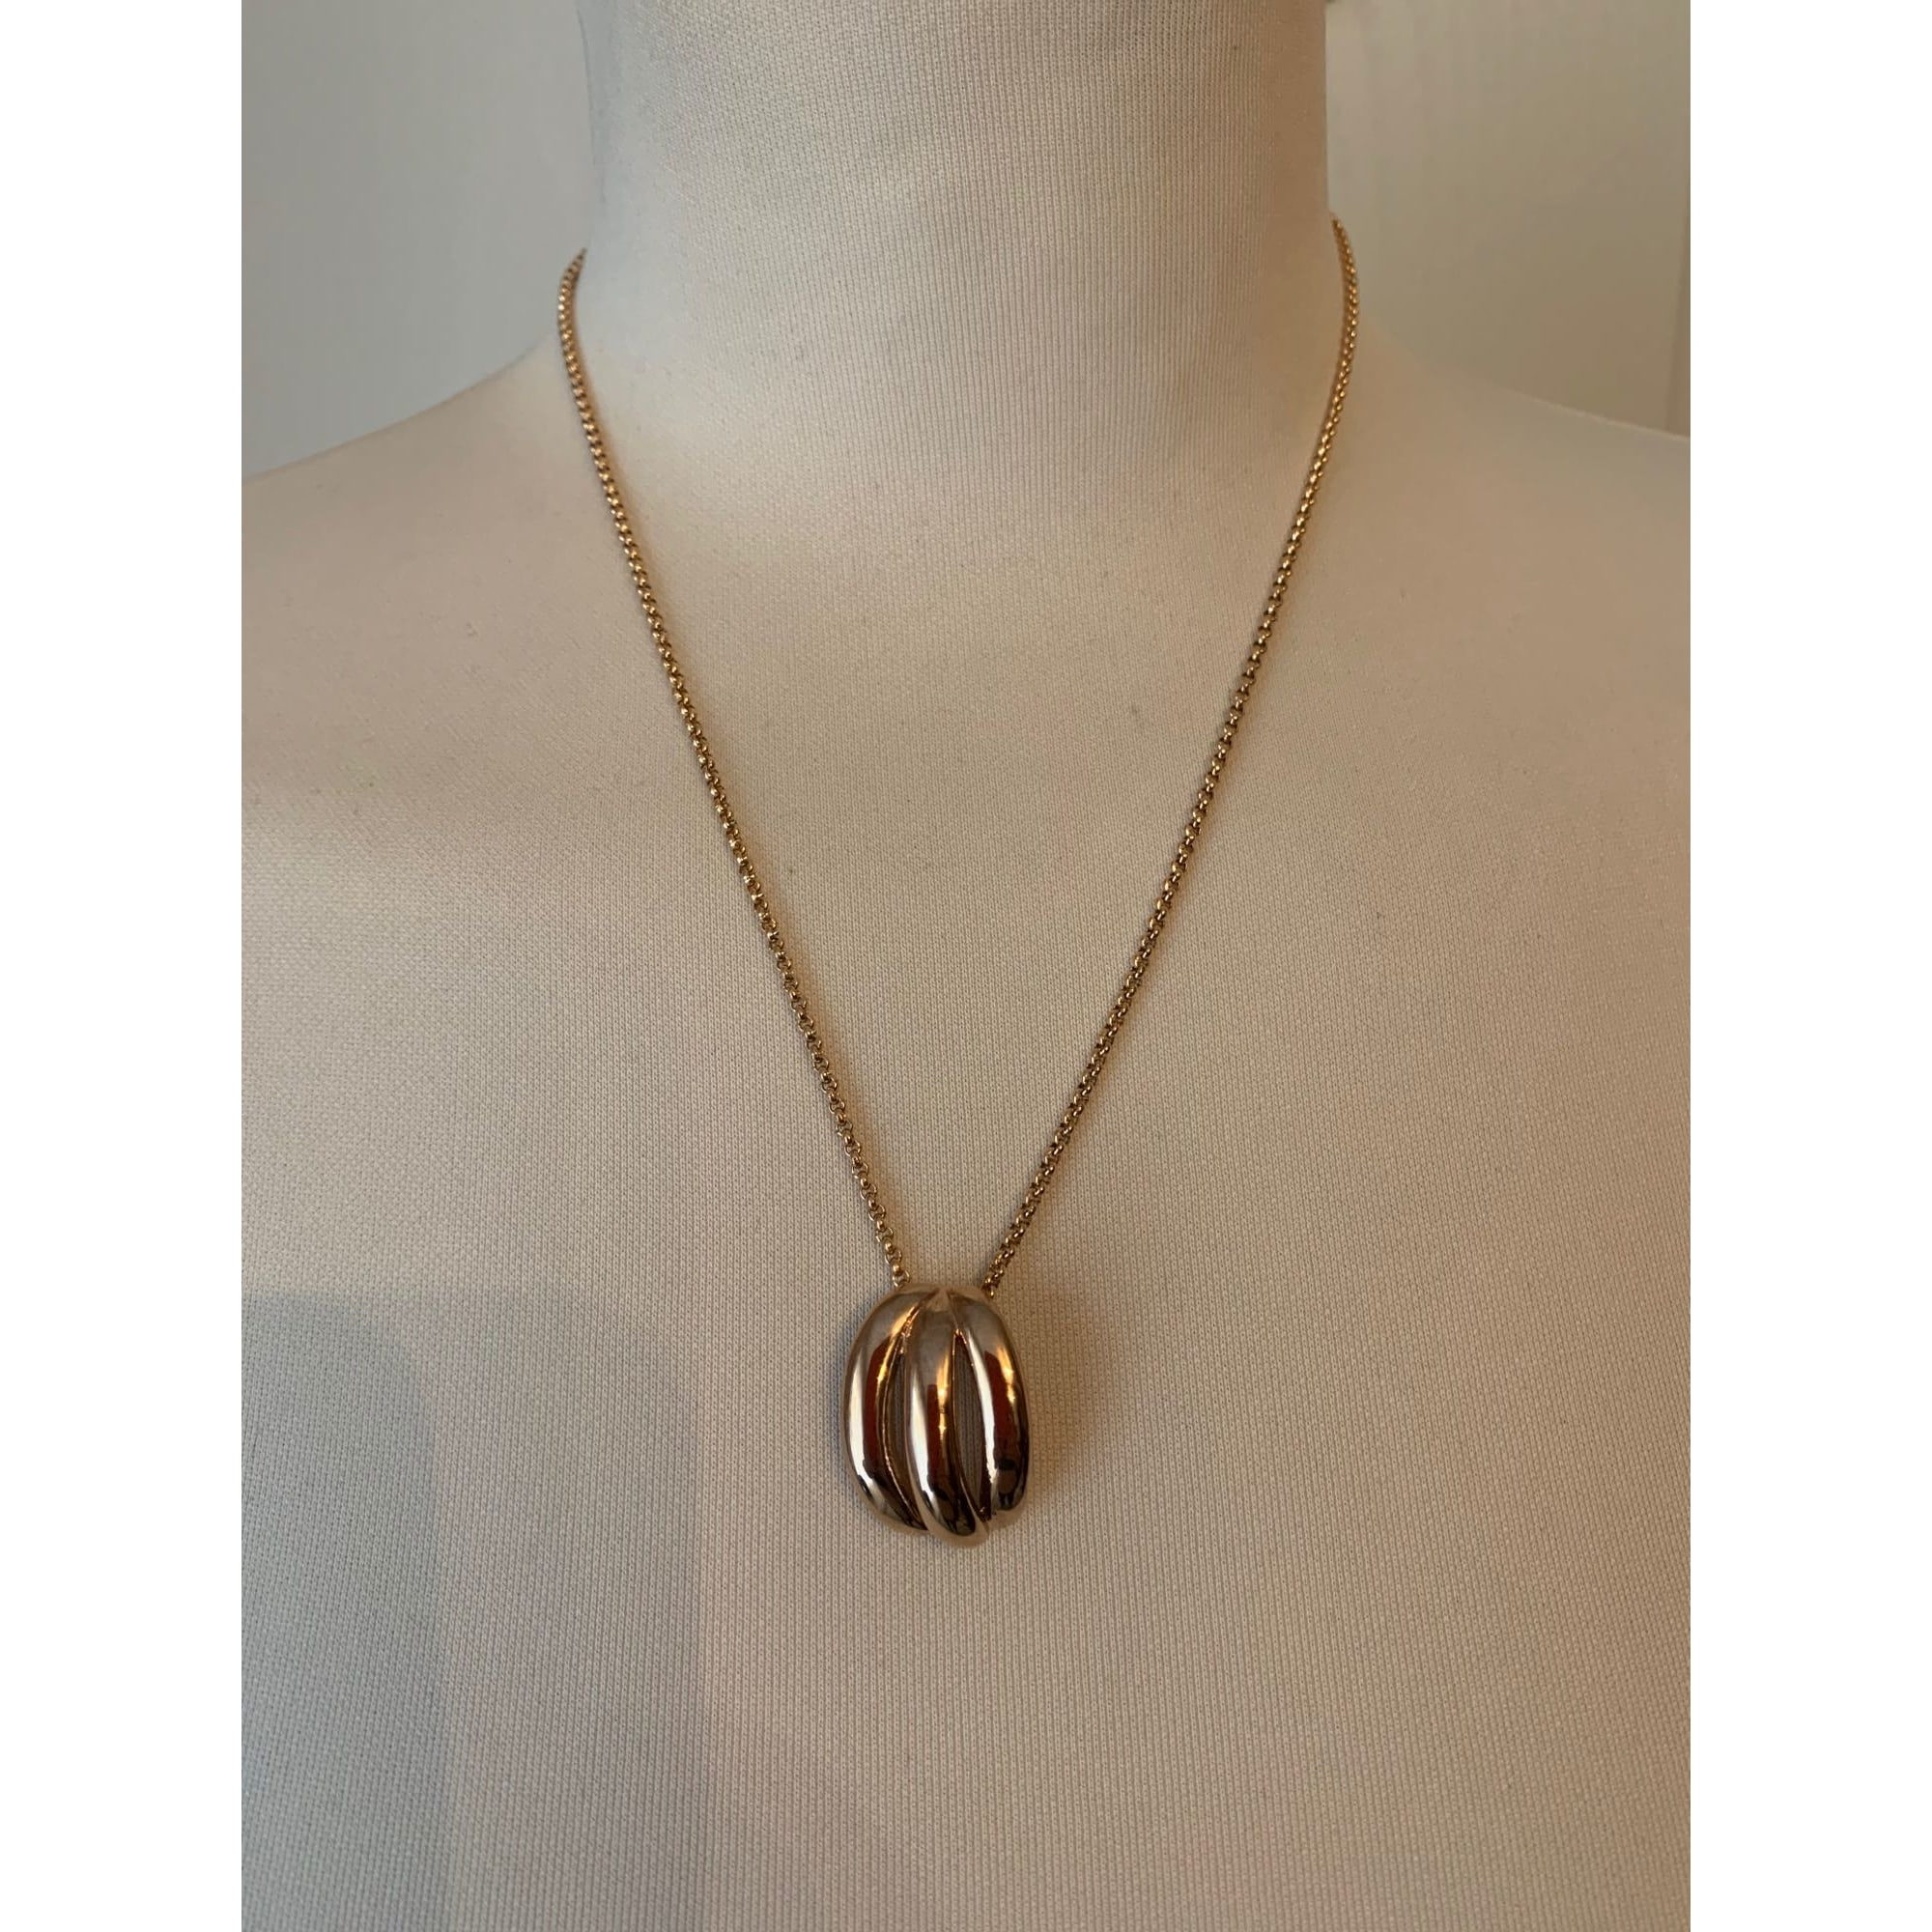 Pendentif, collier pendentif VICTORIA Doré, bronze, cuivre